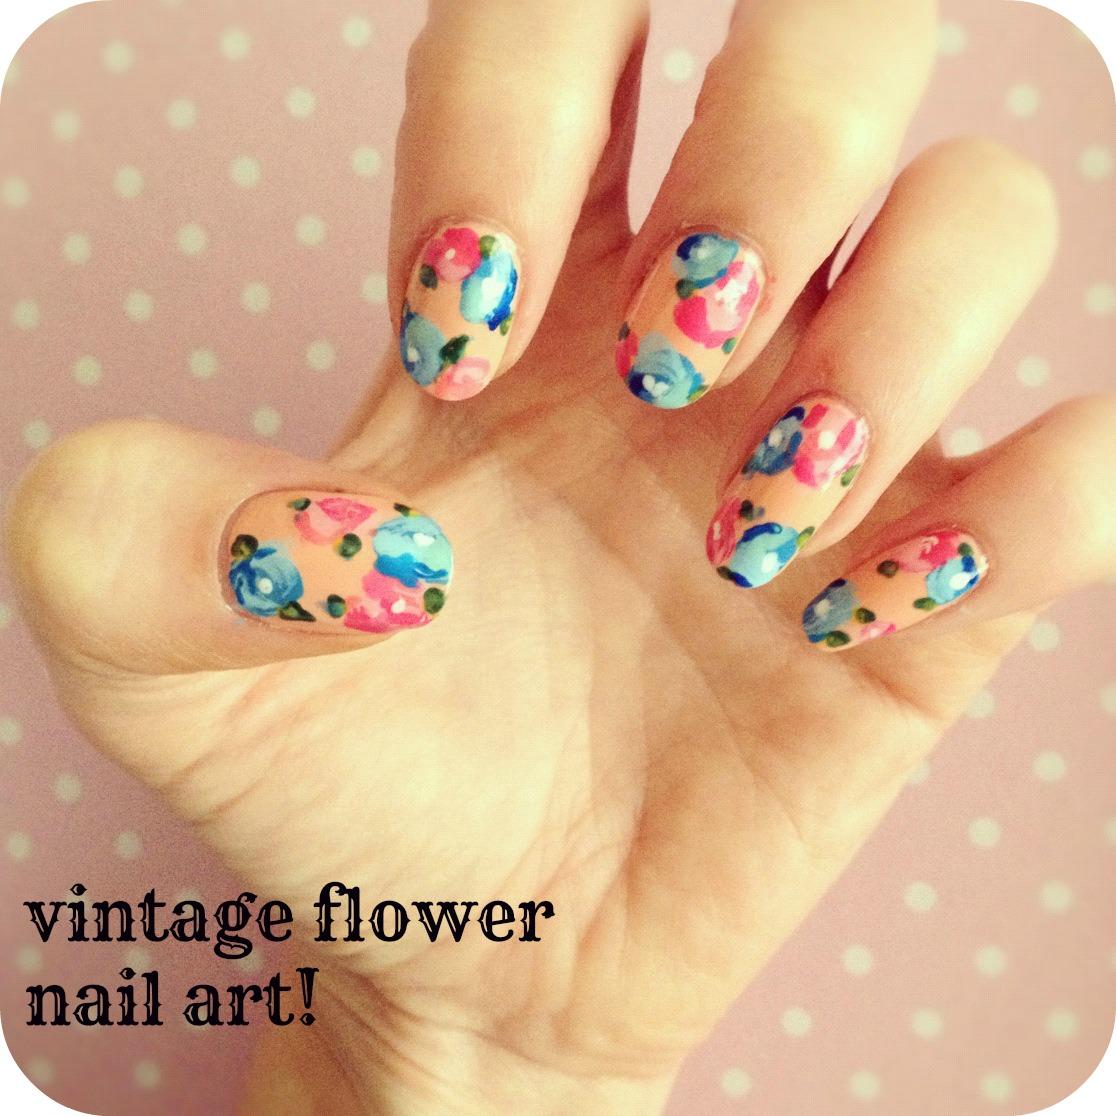 vintage flower nail art: | BURKATRON